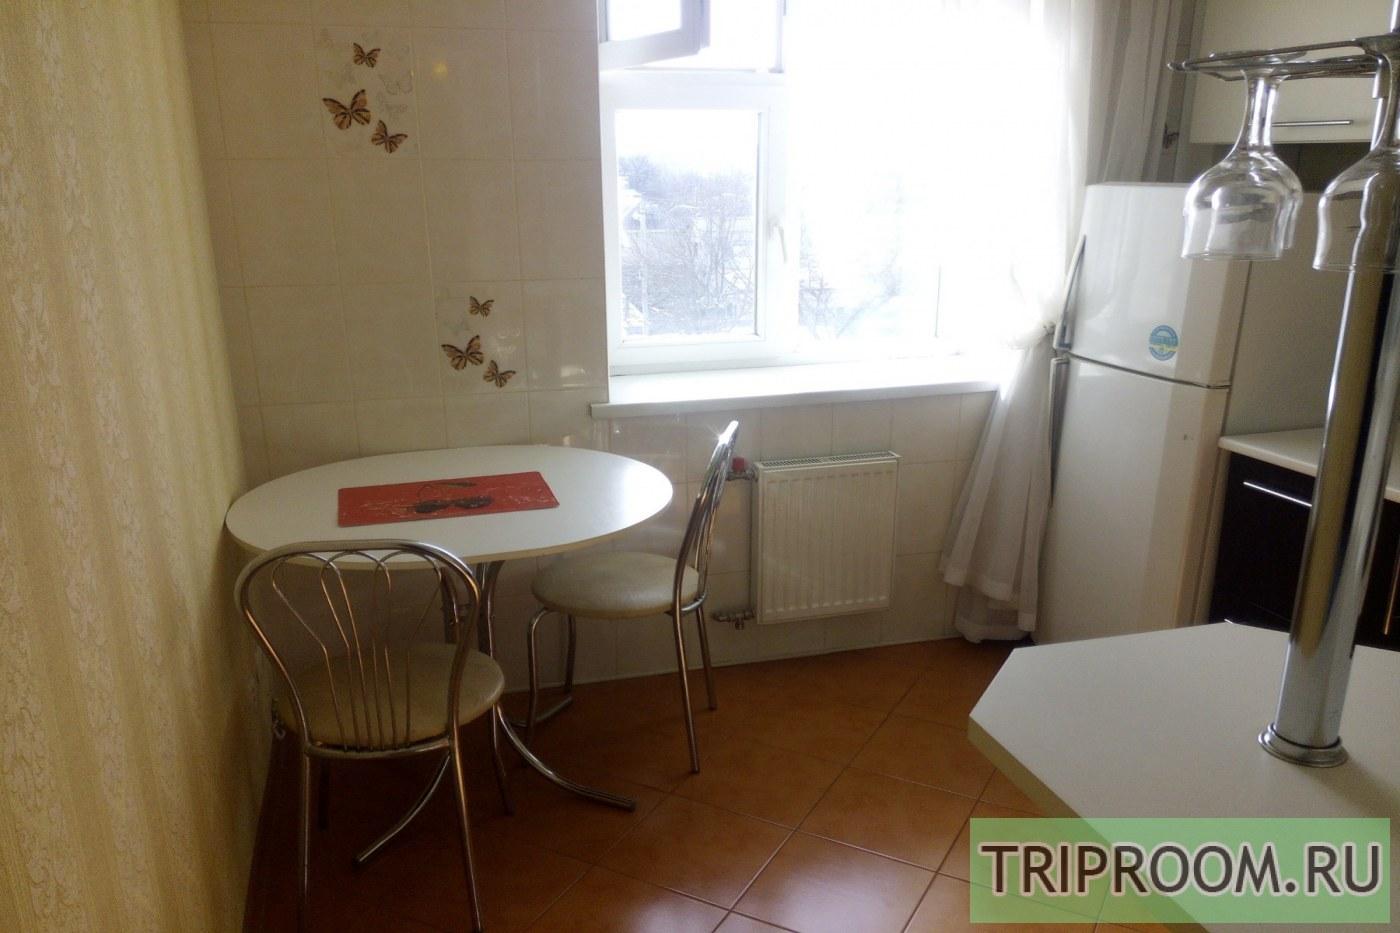 1-комнатная квартира посуточно (вариант № 38995), ул. Лексина улица, фото № 2